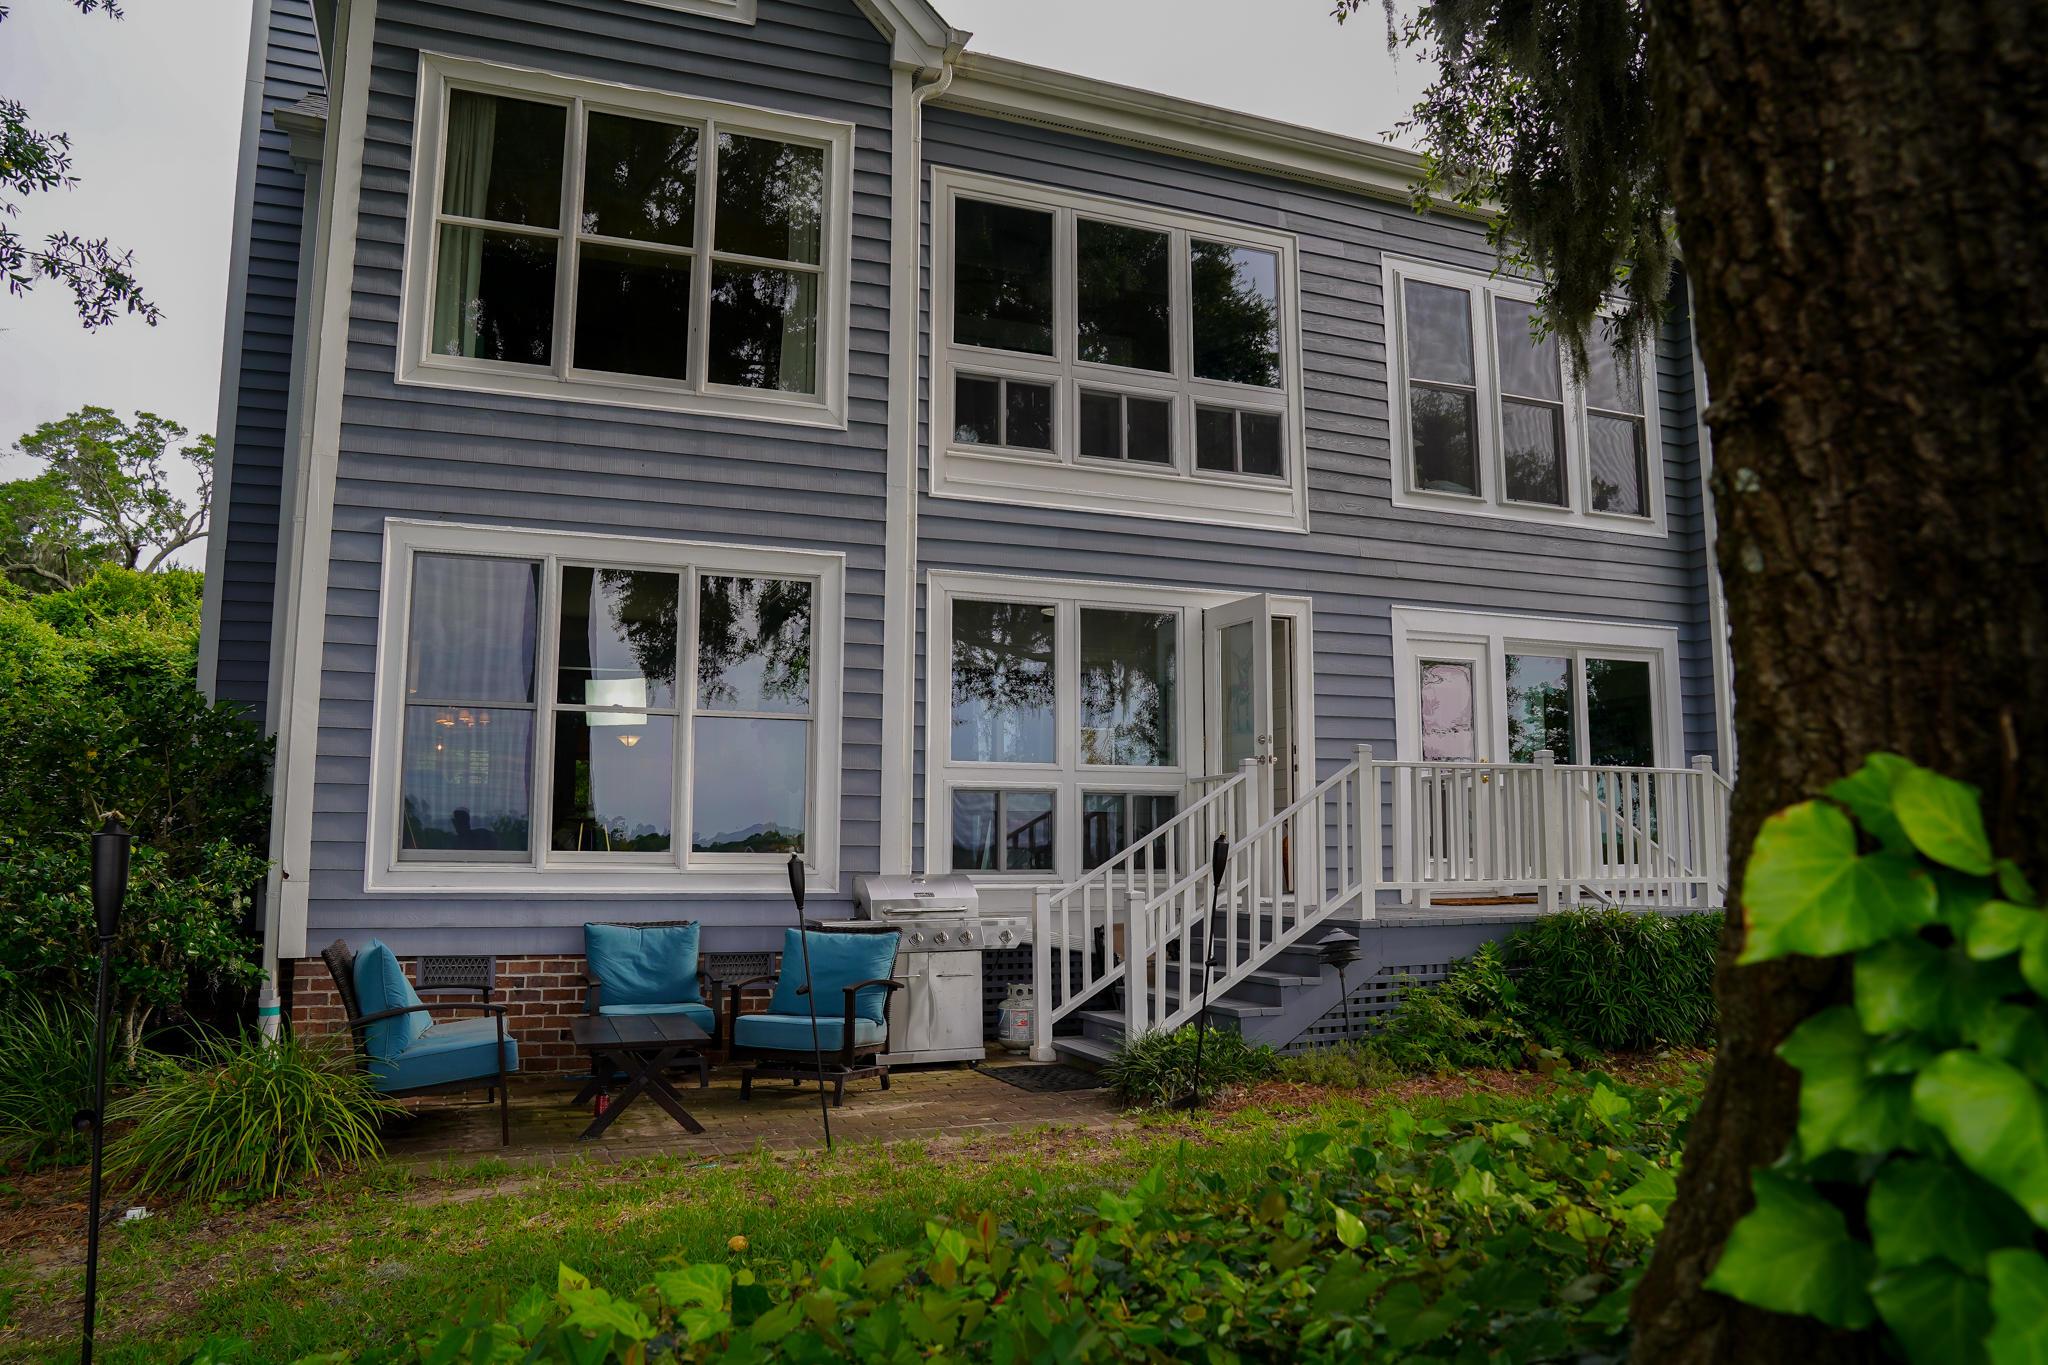 Waterfront Plantation Homes For Sale - 112 Waterfront Plantation, Charleston, SC - 2